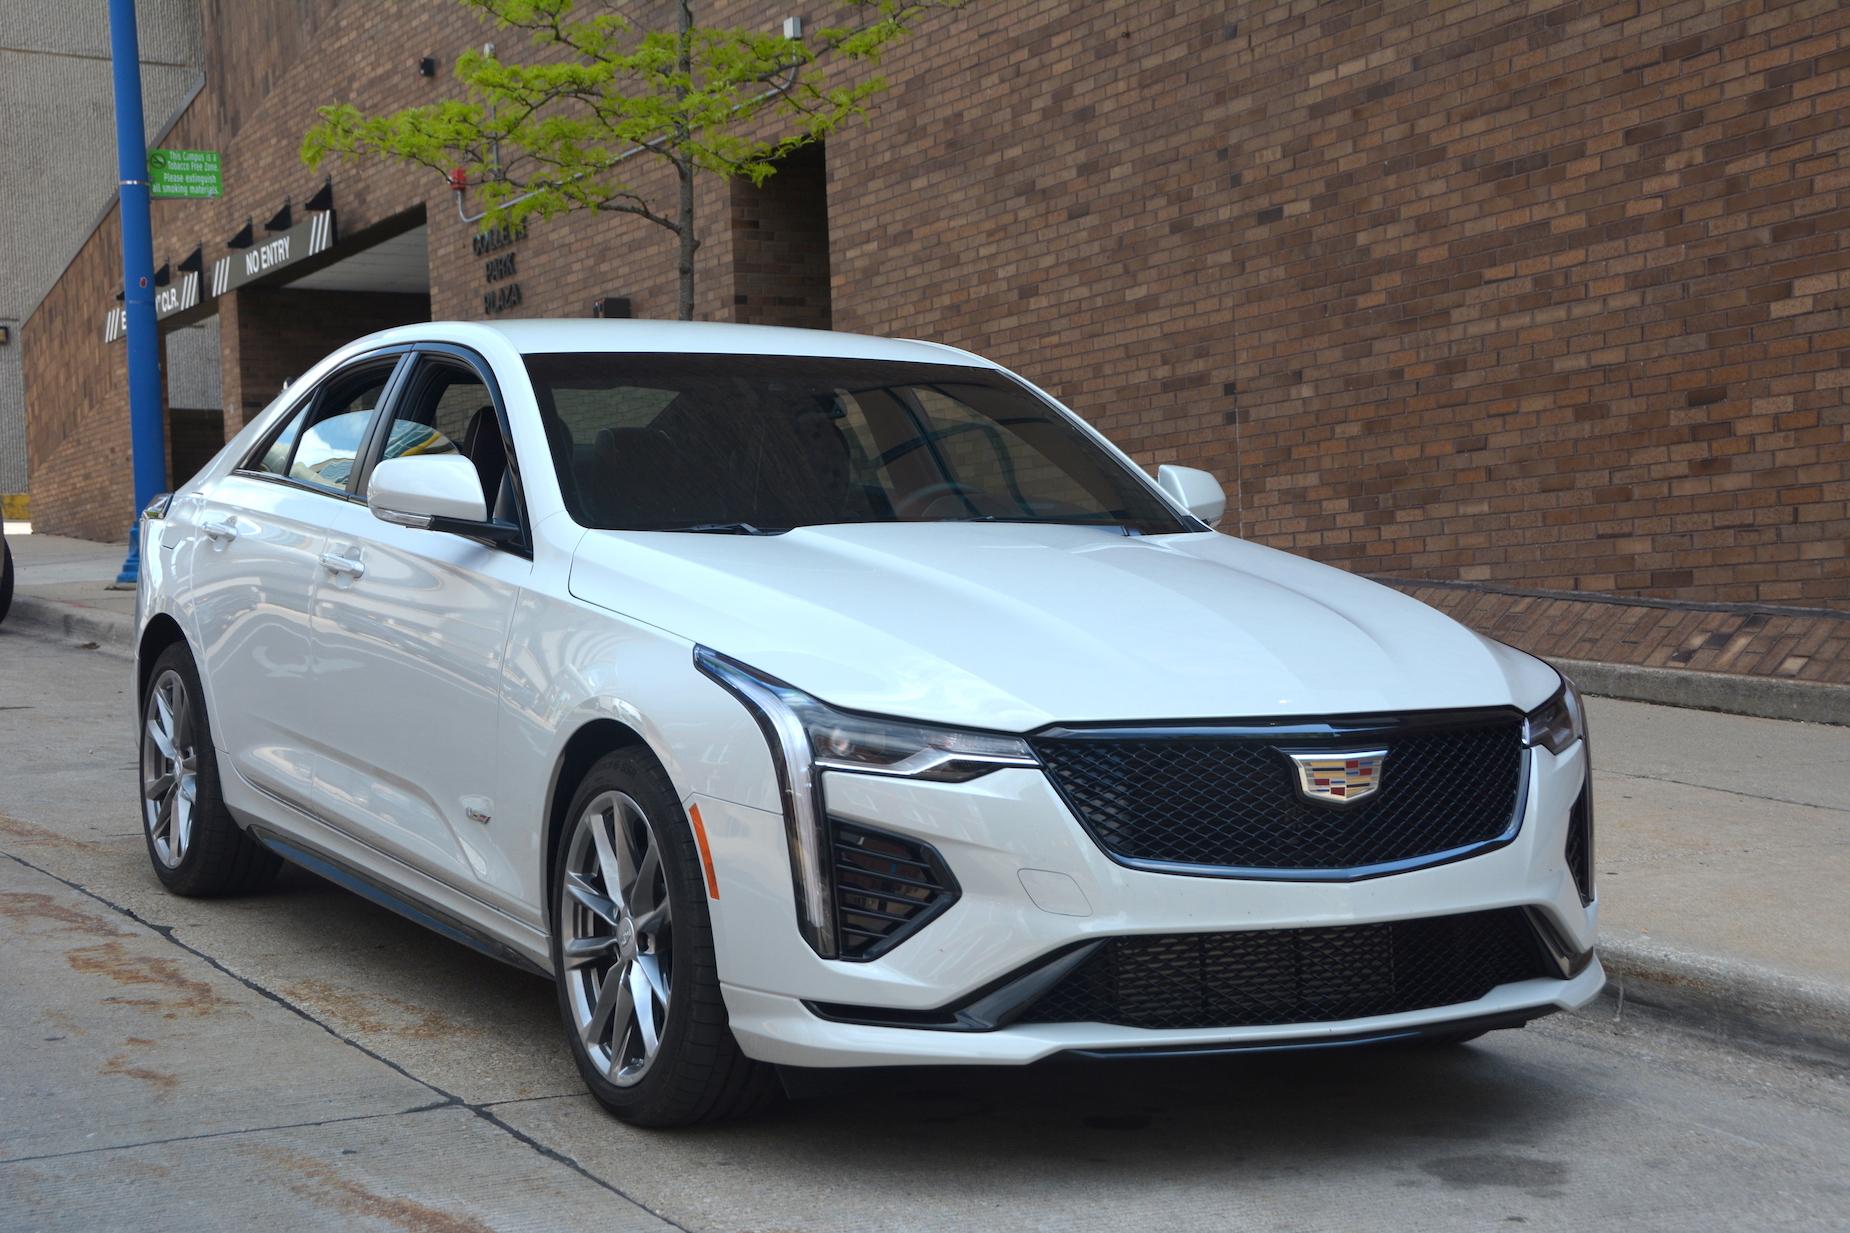 2021 Cadillac CT4-V price